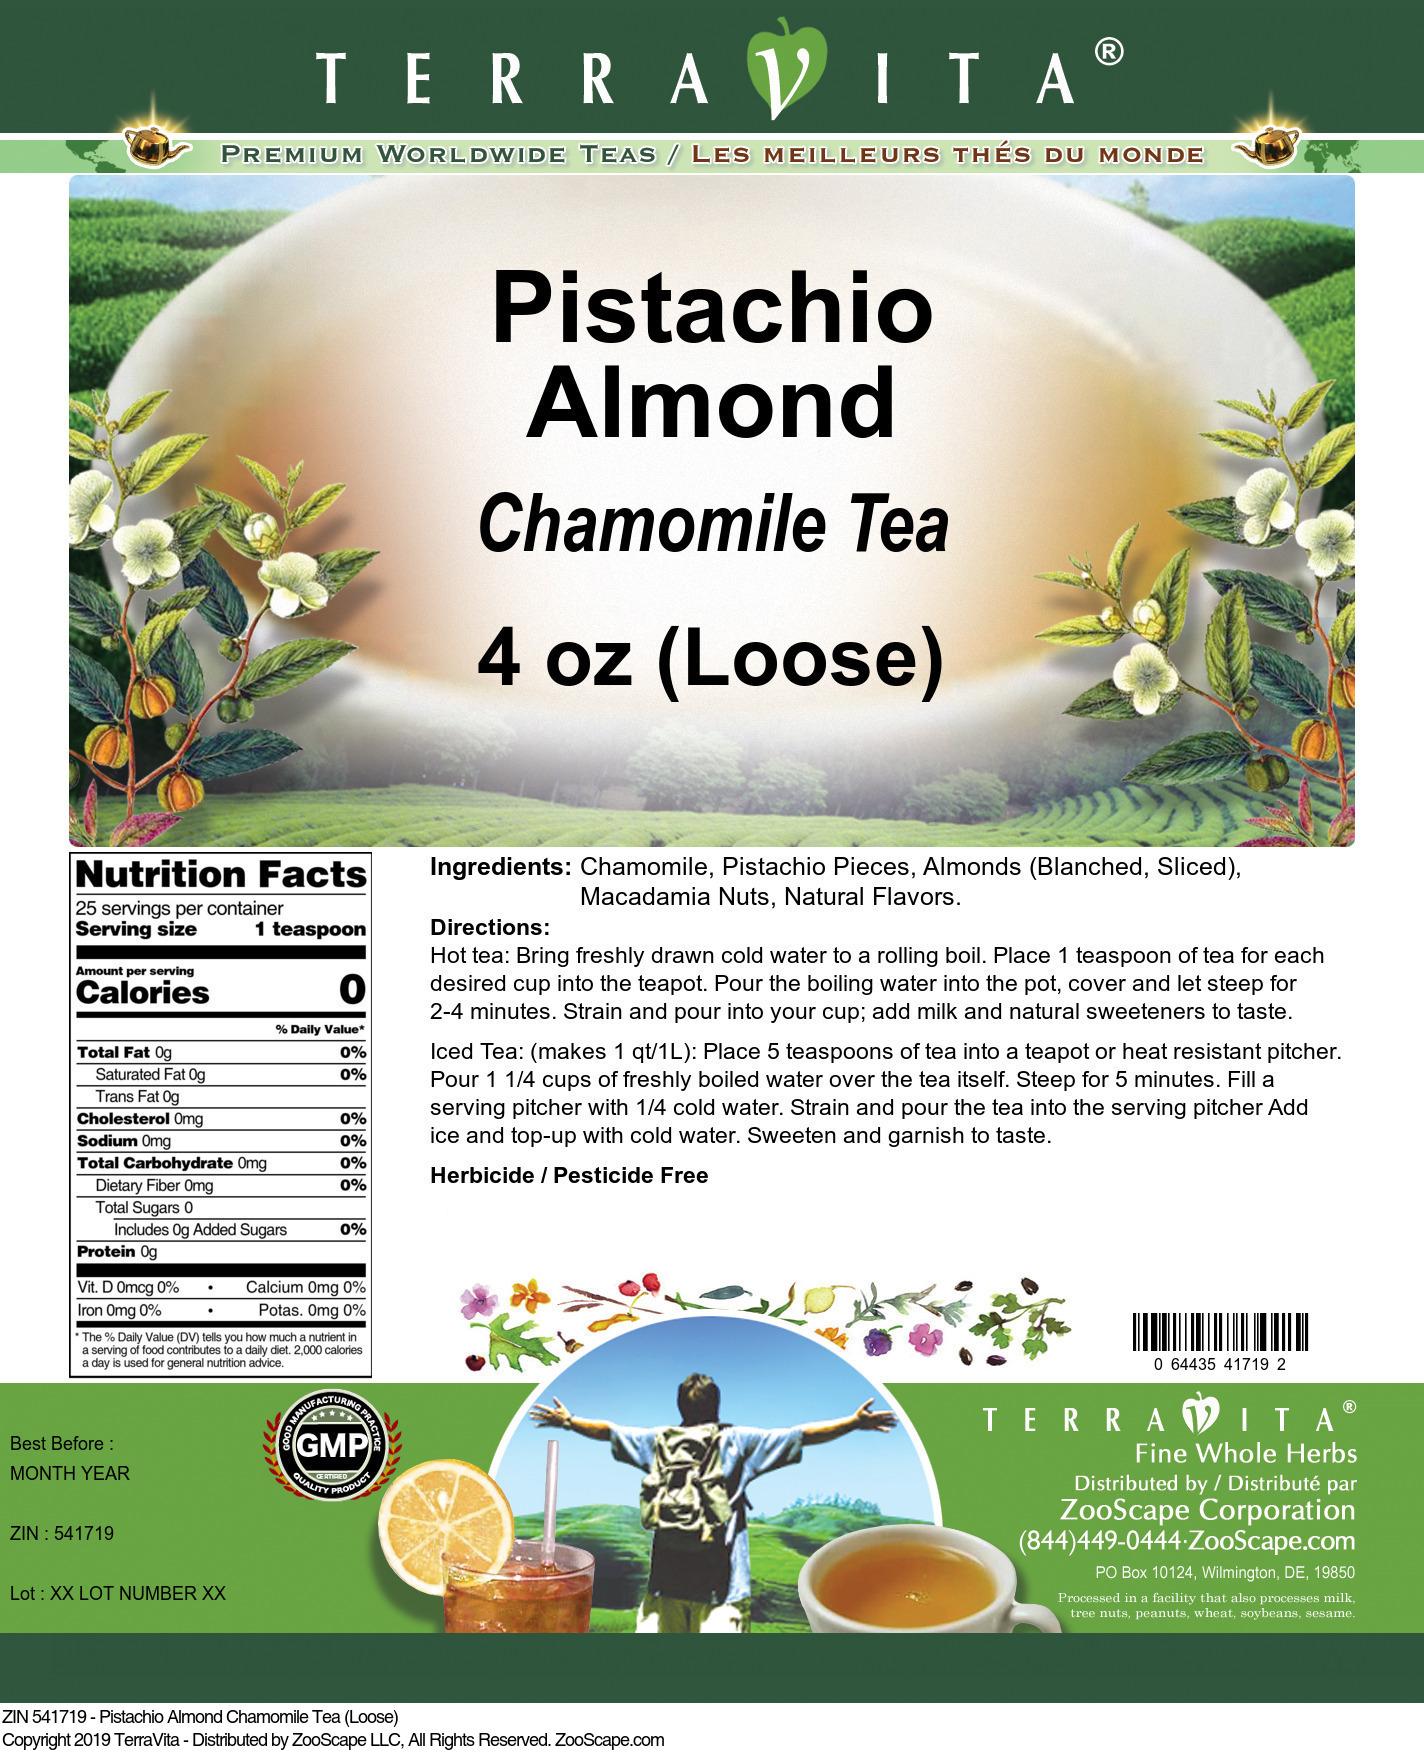 Pistachio Almond Chamomile Tea (Loose)